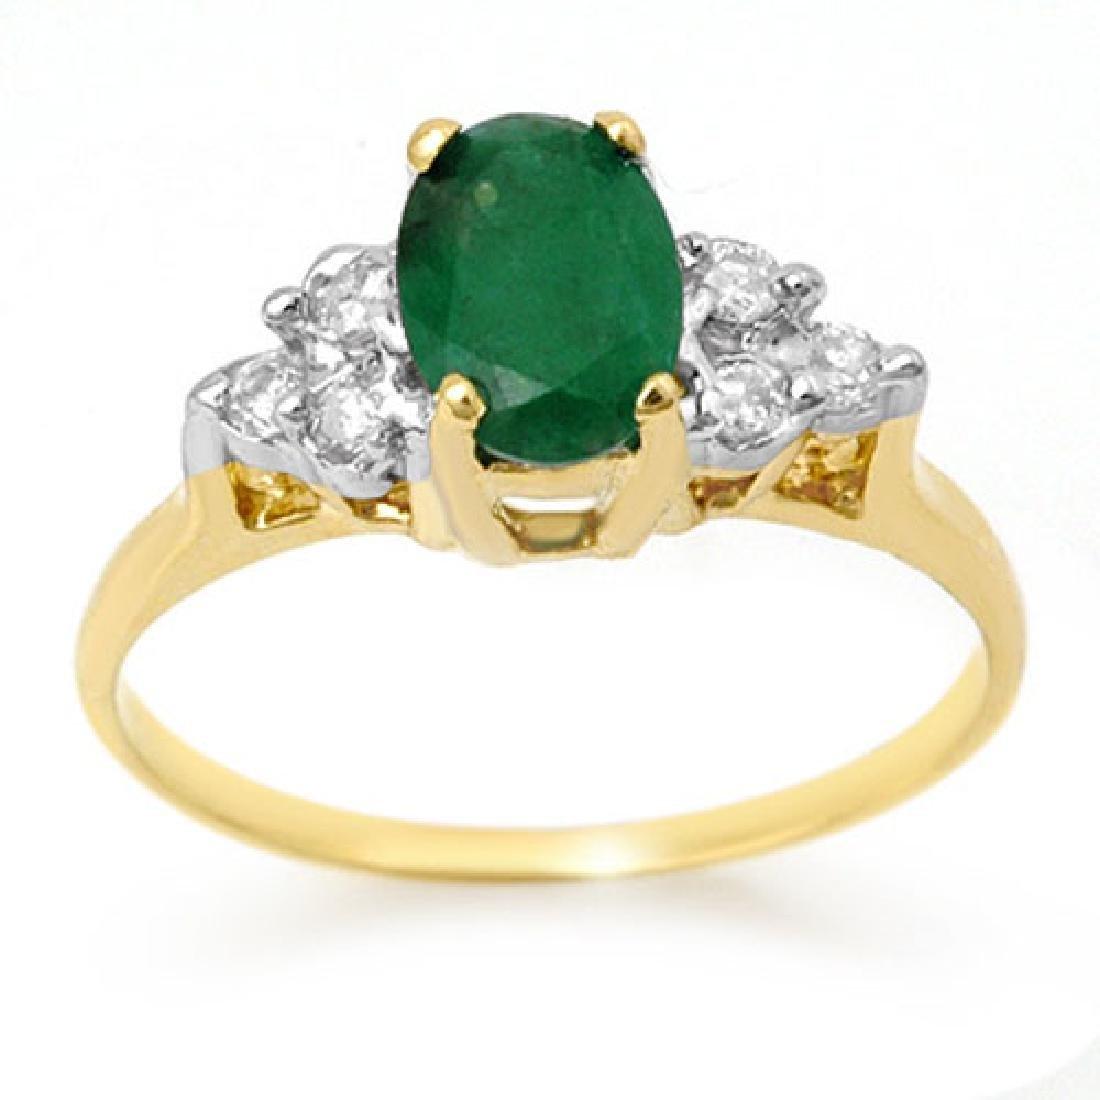 1.18 CTW Emerald & Diamond Ring 14K Yellow Gold